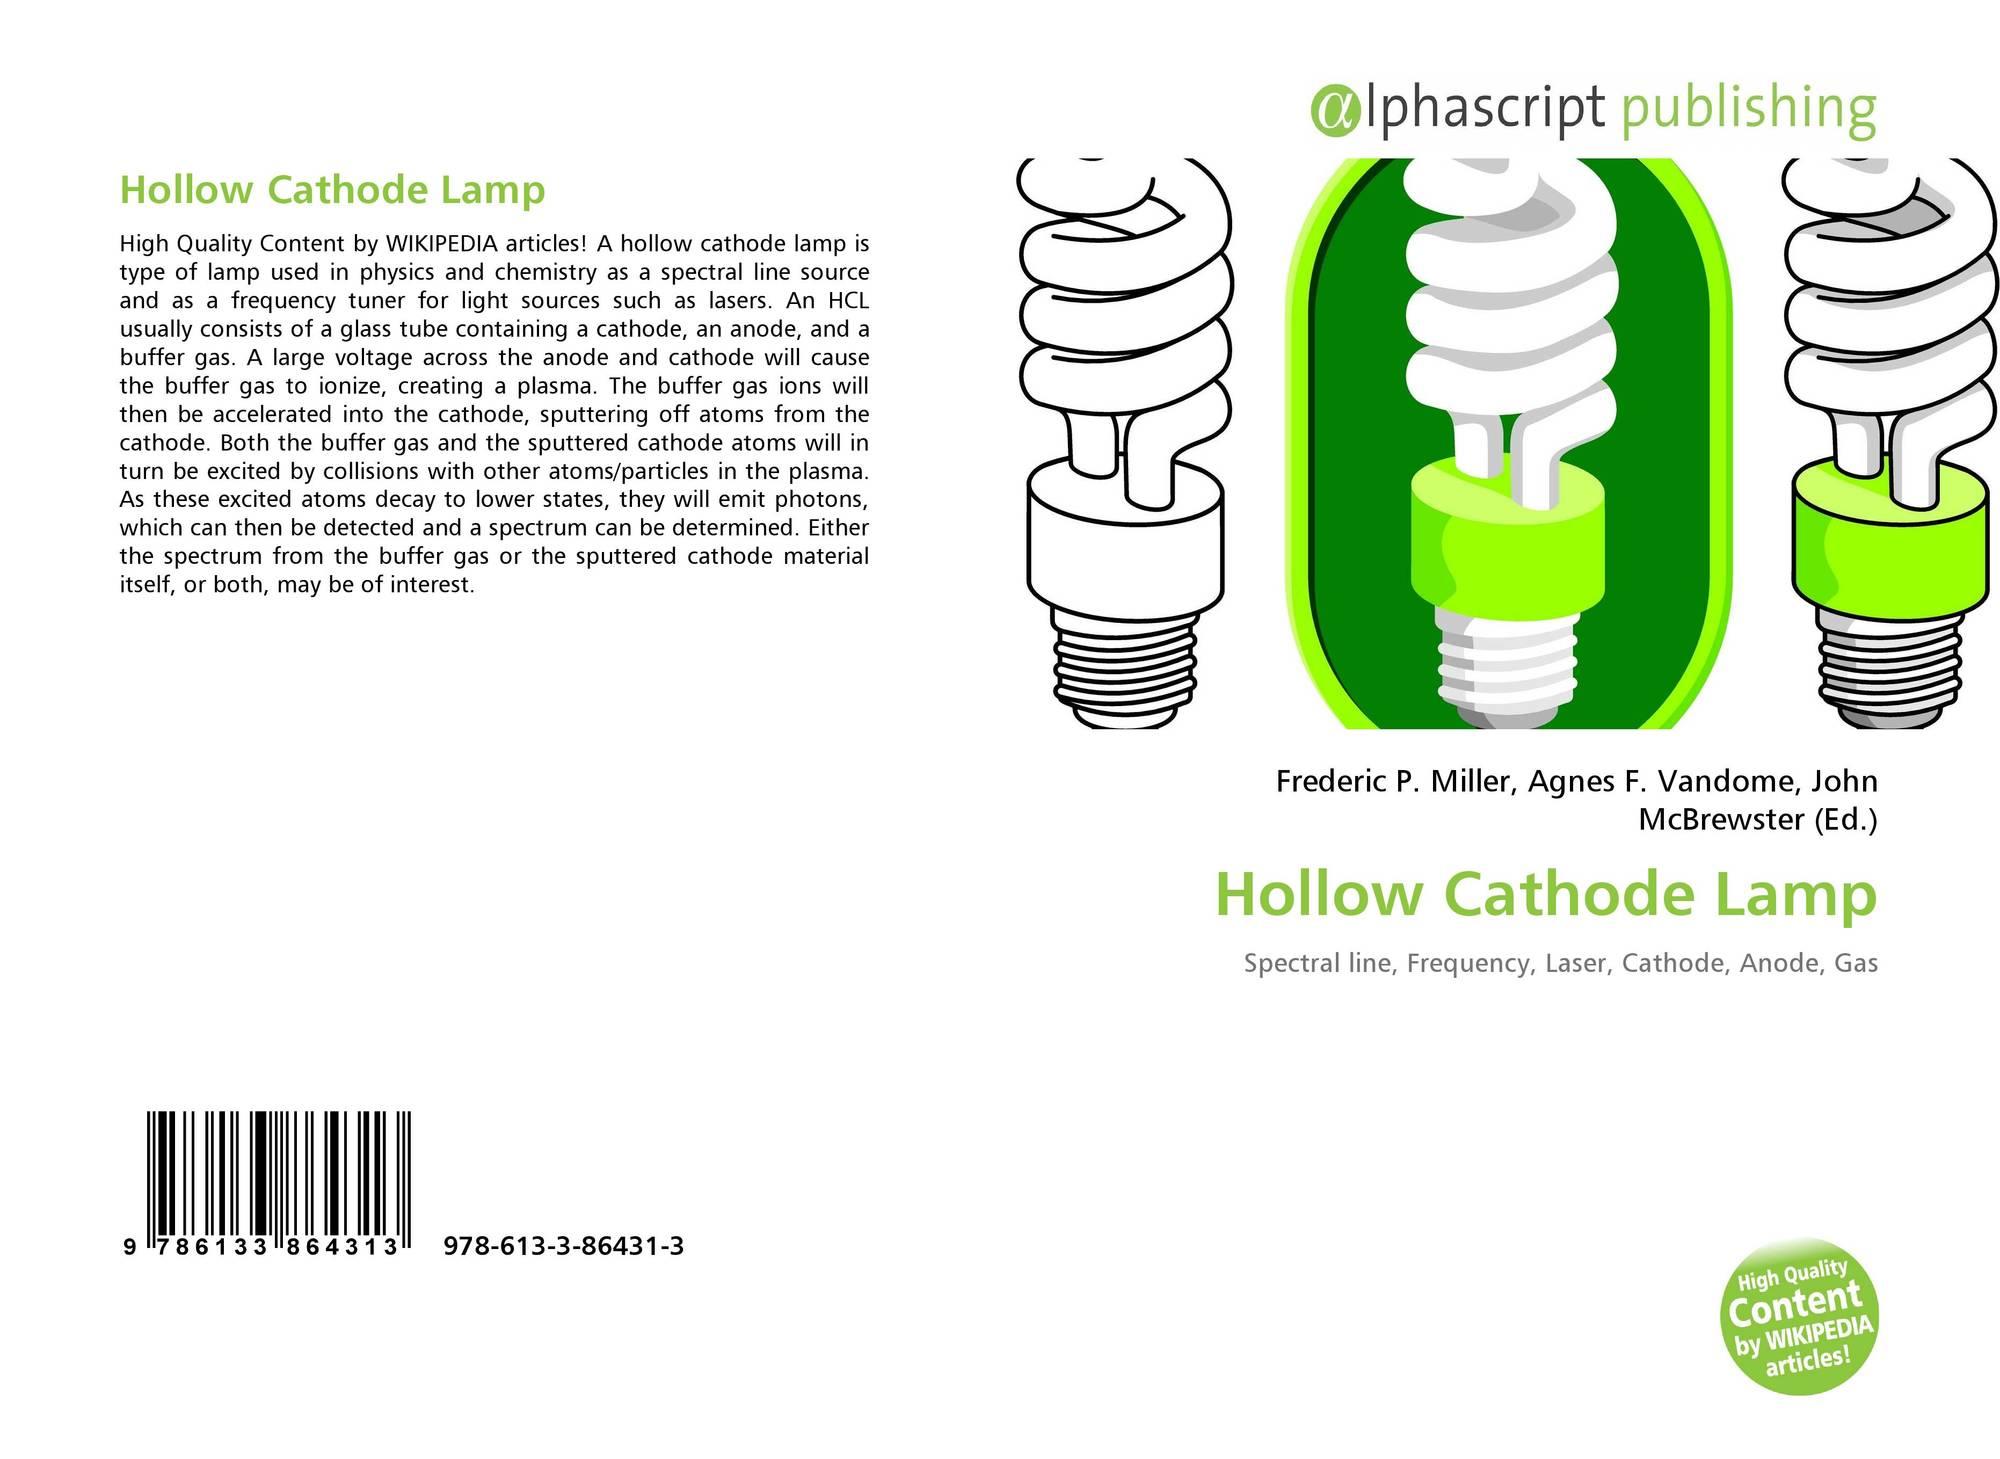 Hollow Cathode Lamp